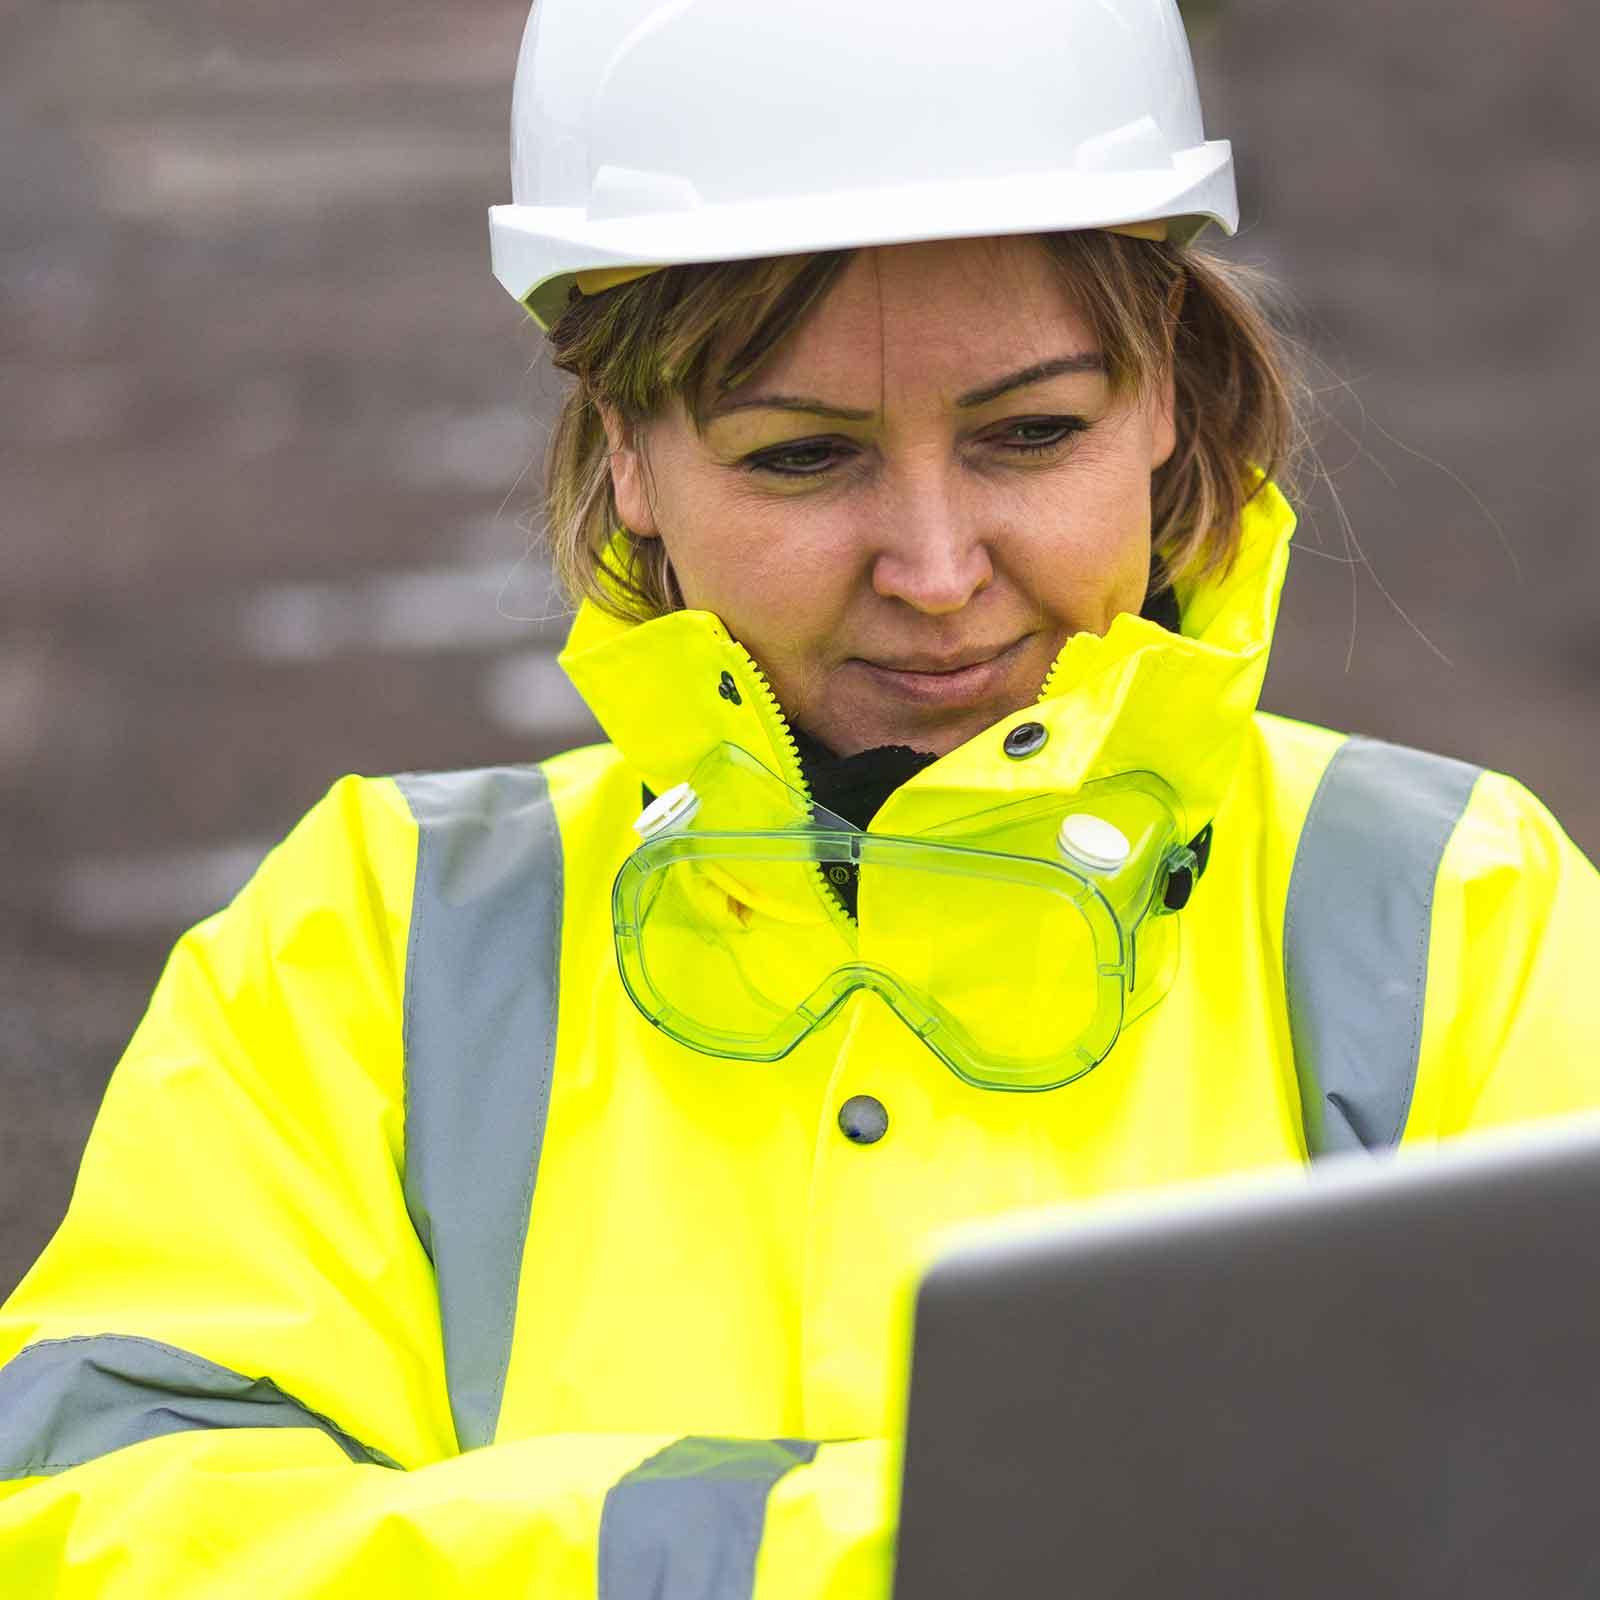 woman-civil-engineer-on-laptop